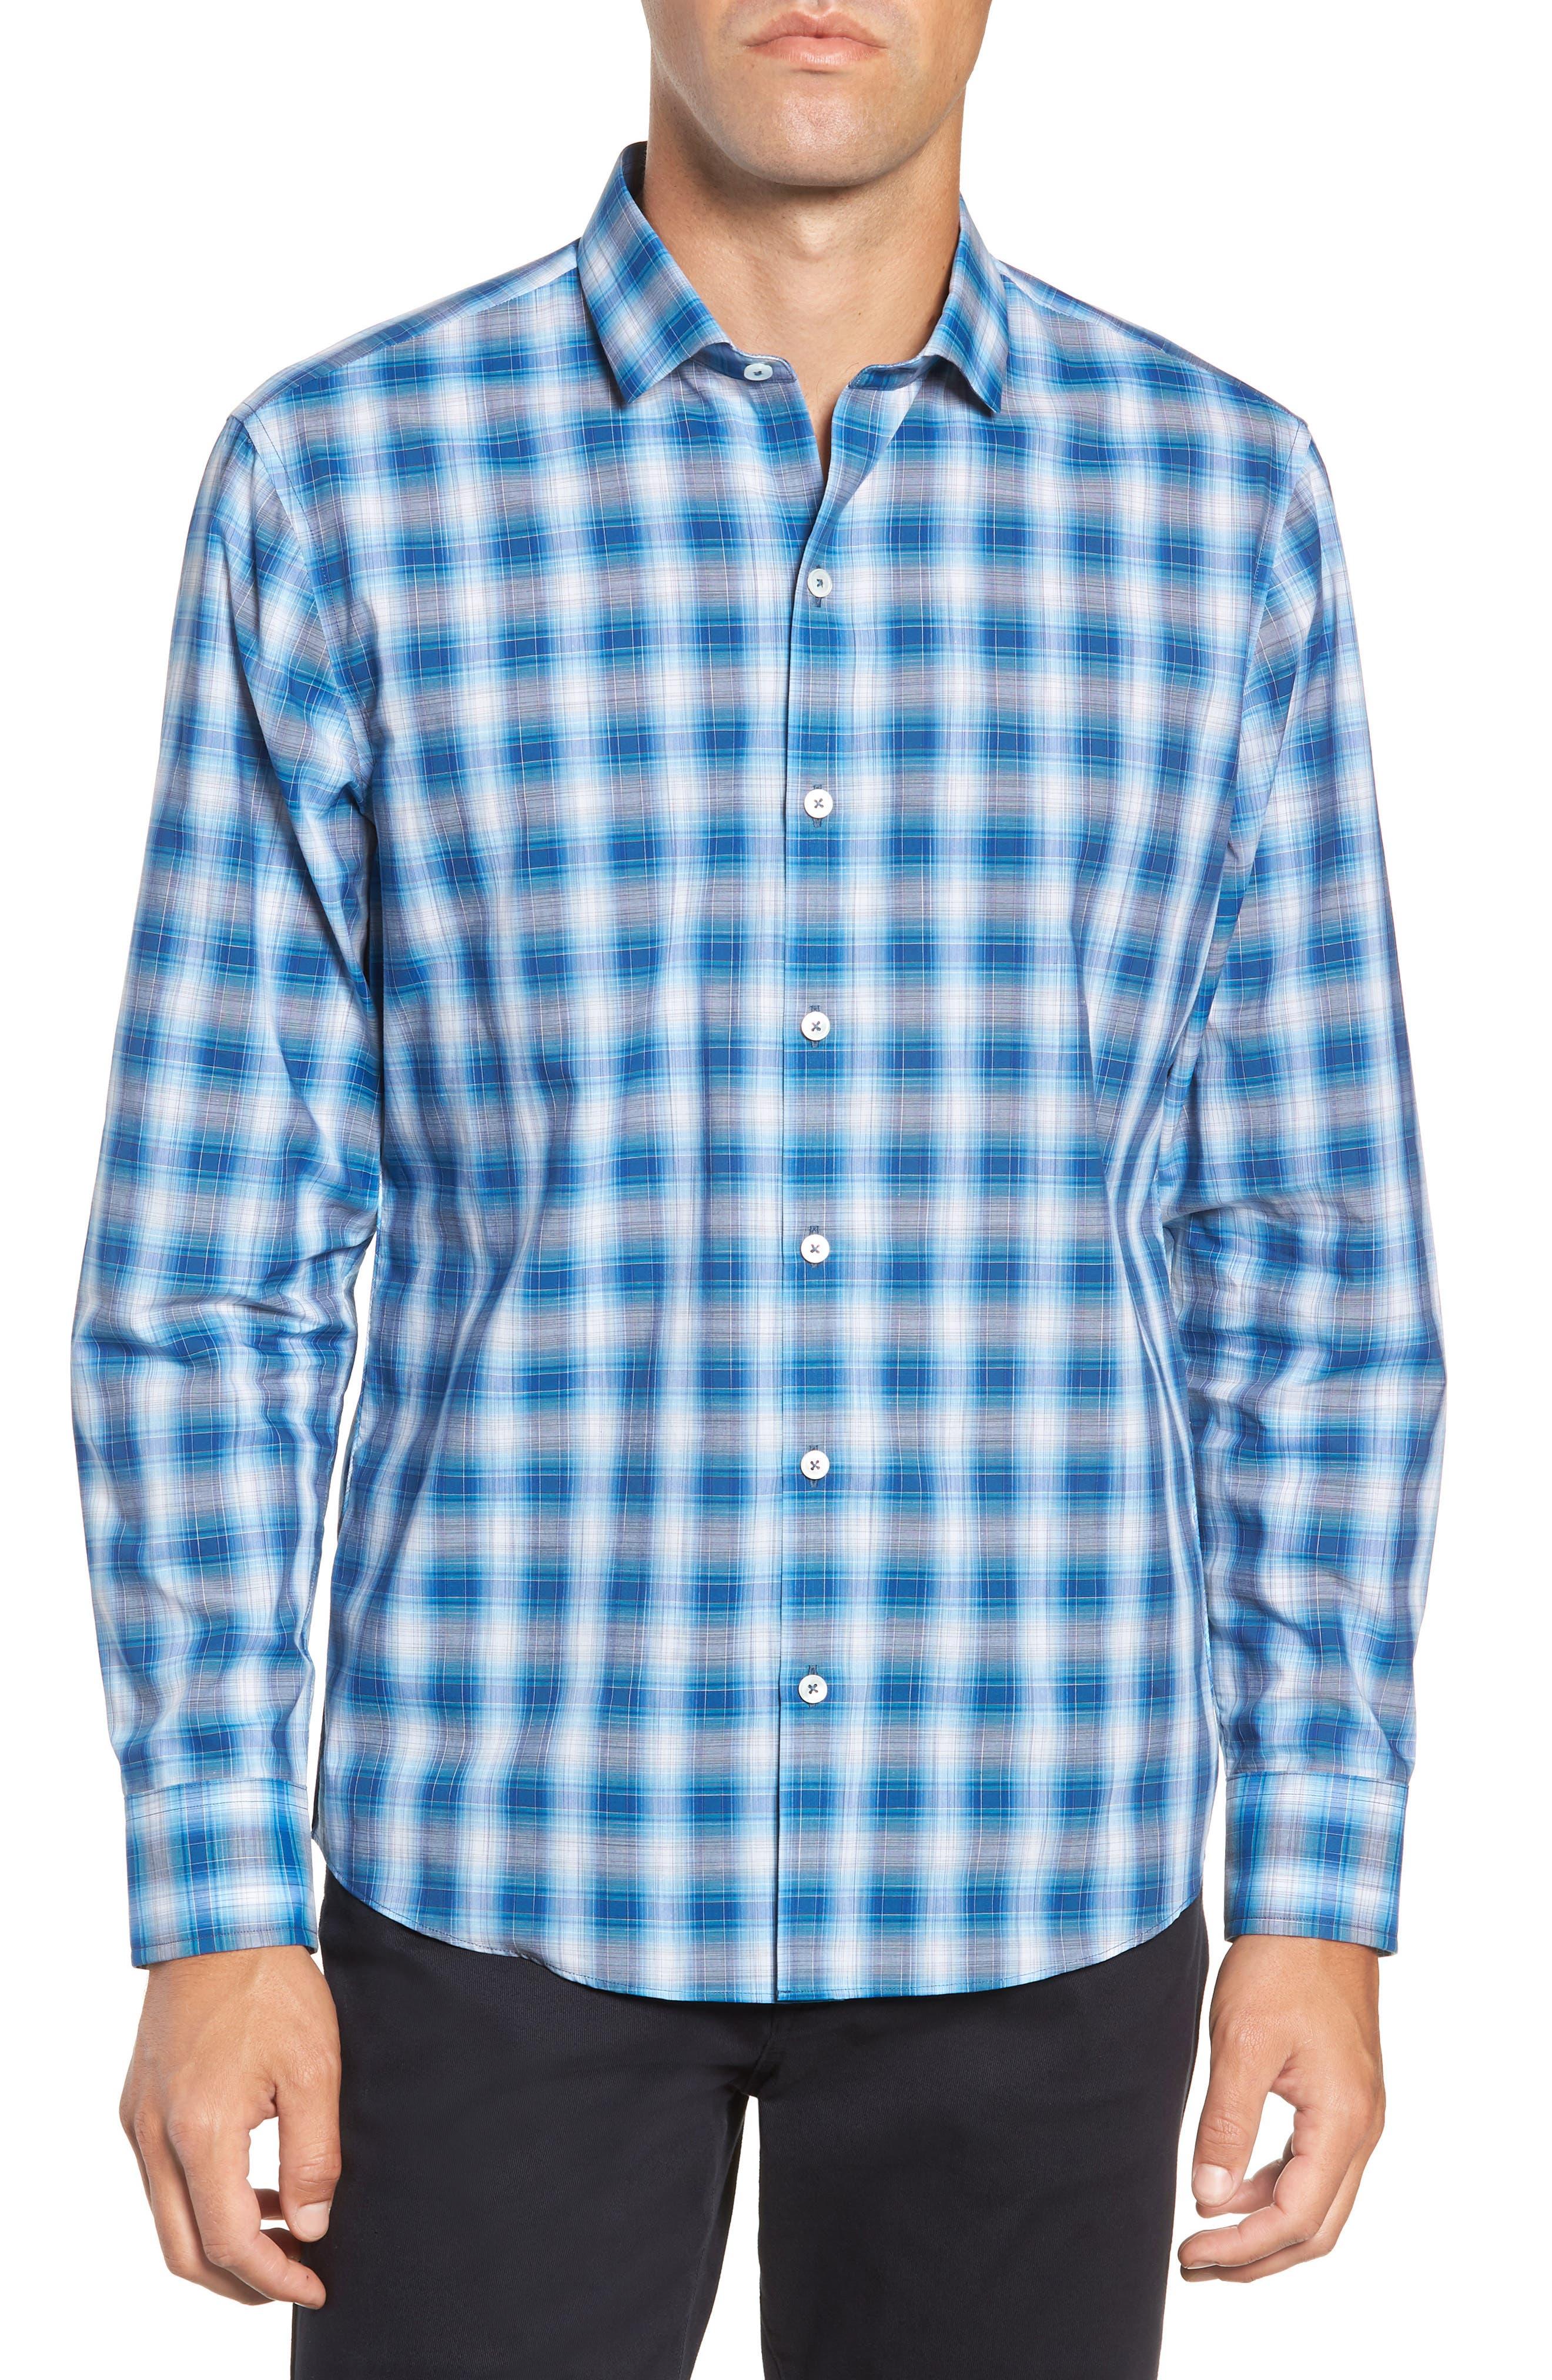 Holtsinger Plaid Sport Shirt,                         Main,                         color, BRIGHT BLUE